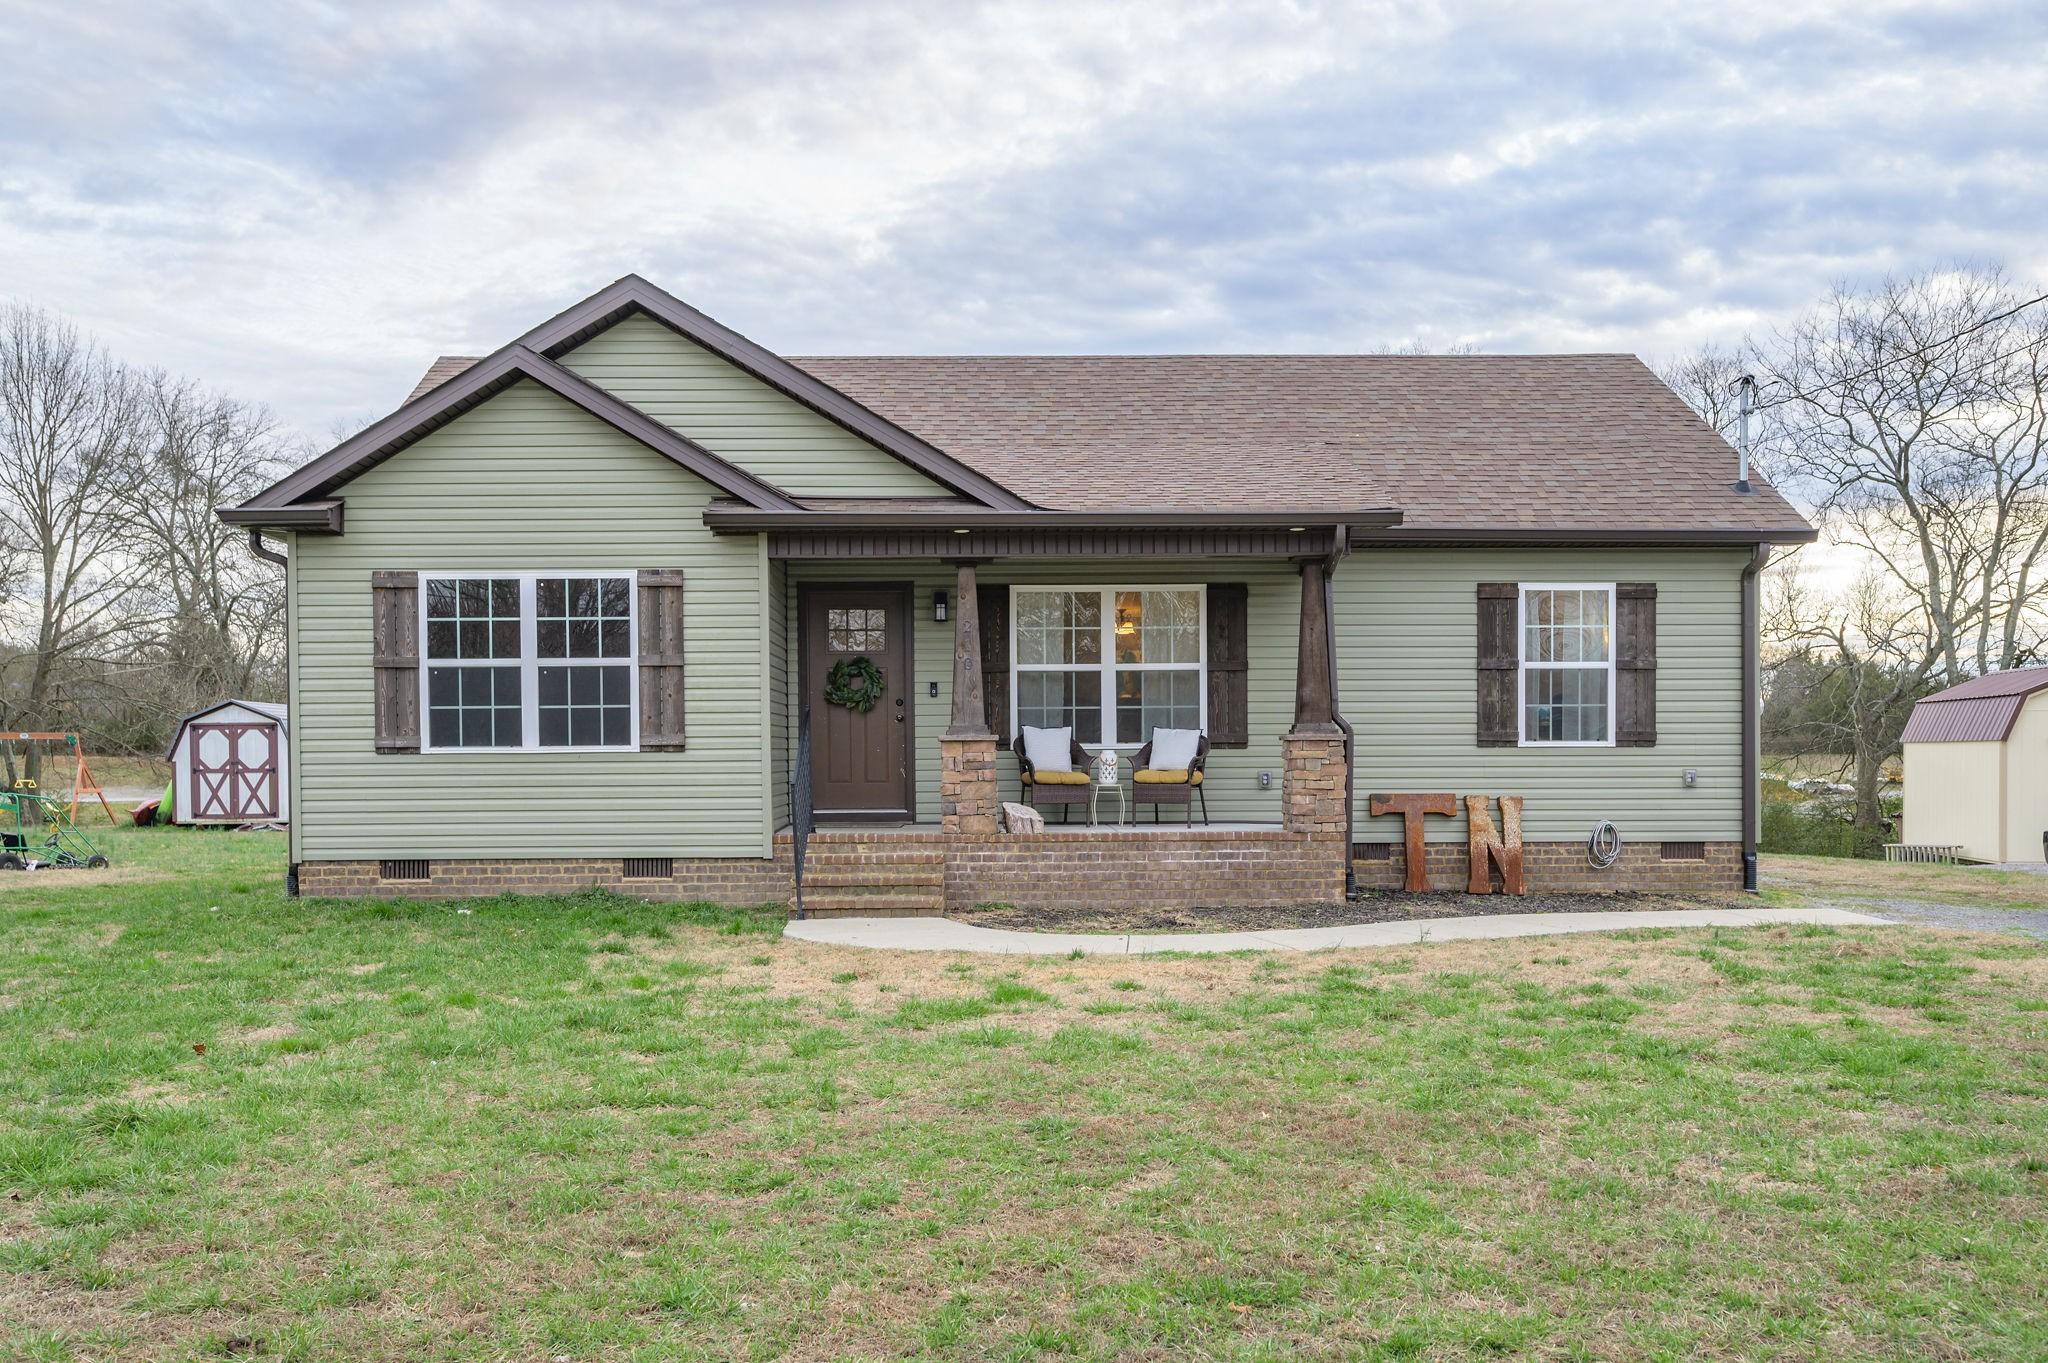 210 Sunset BLVD, Wartrace, TN 37183 - Wartrace, TN real estate listing